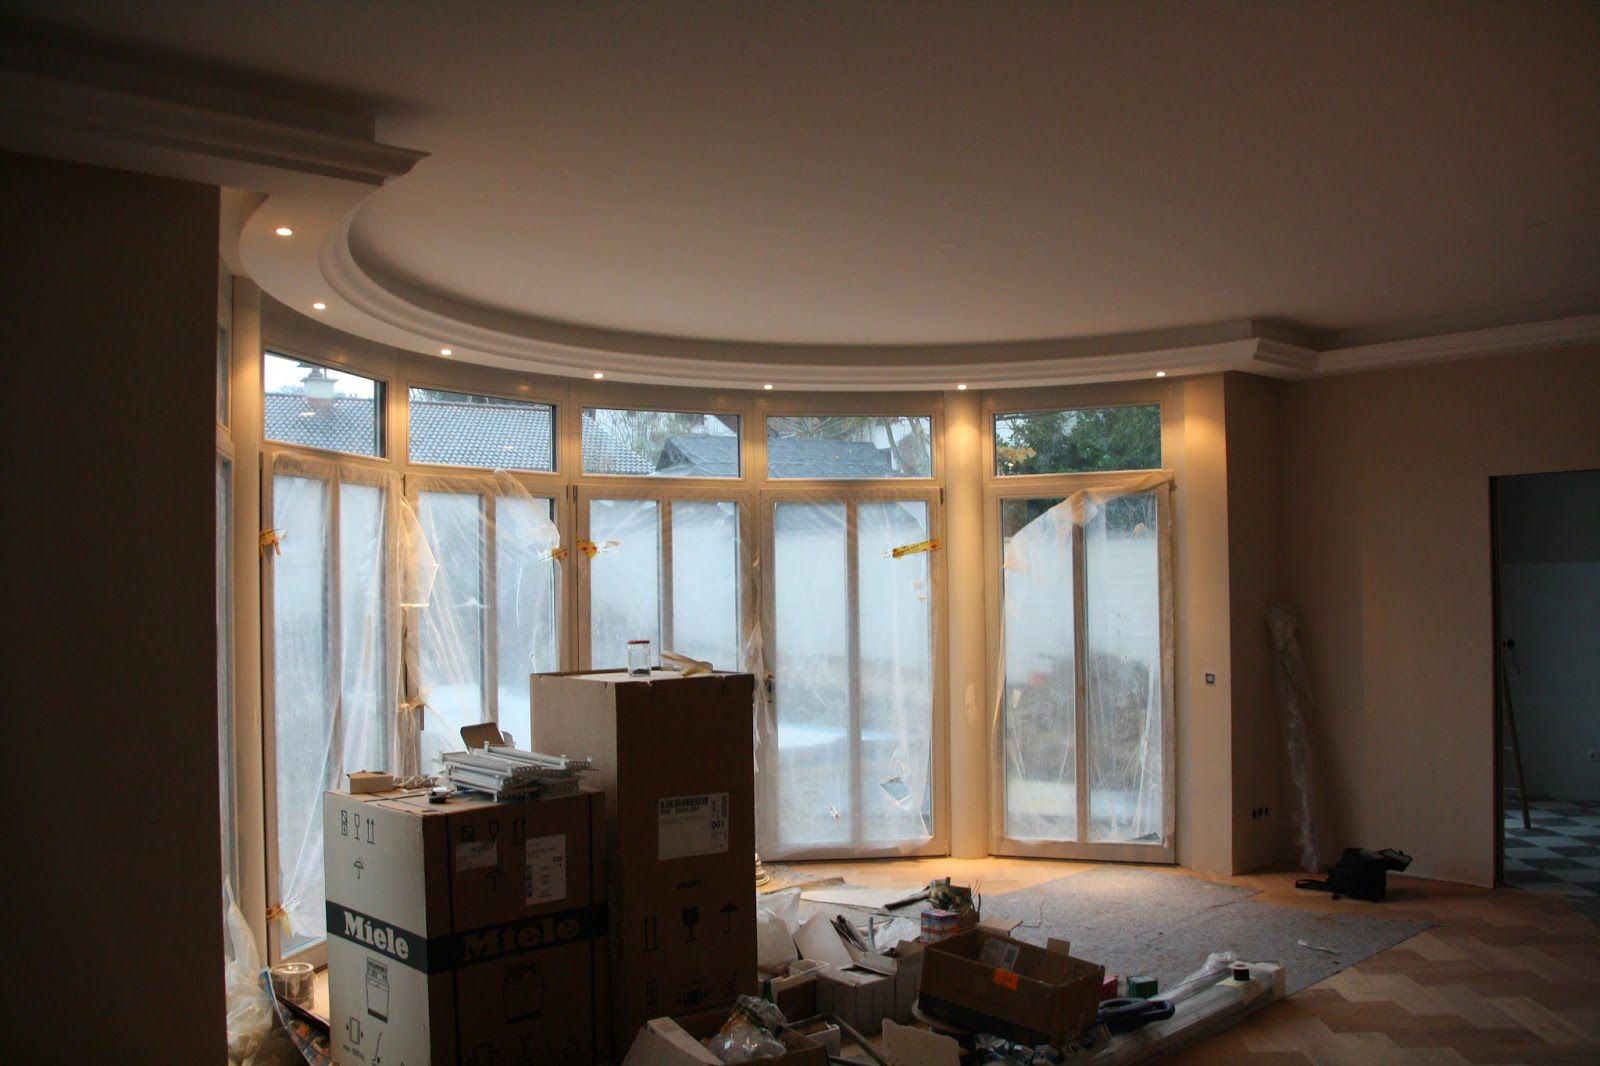 indirekte beleuchtung amazing raumteiler genial indirekte. Black Bedroom Furniture Sets. Home Design Ideas